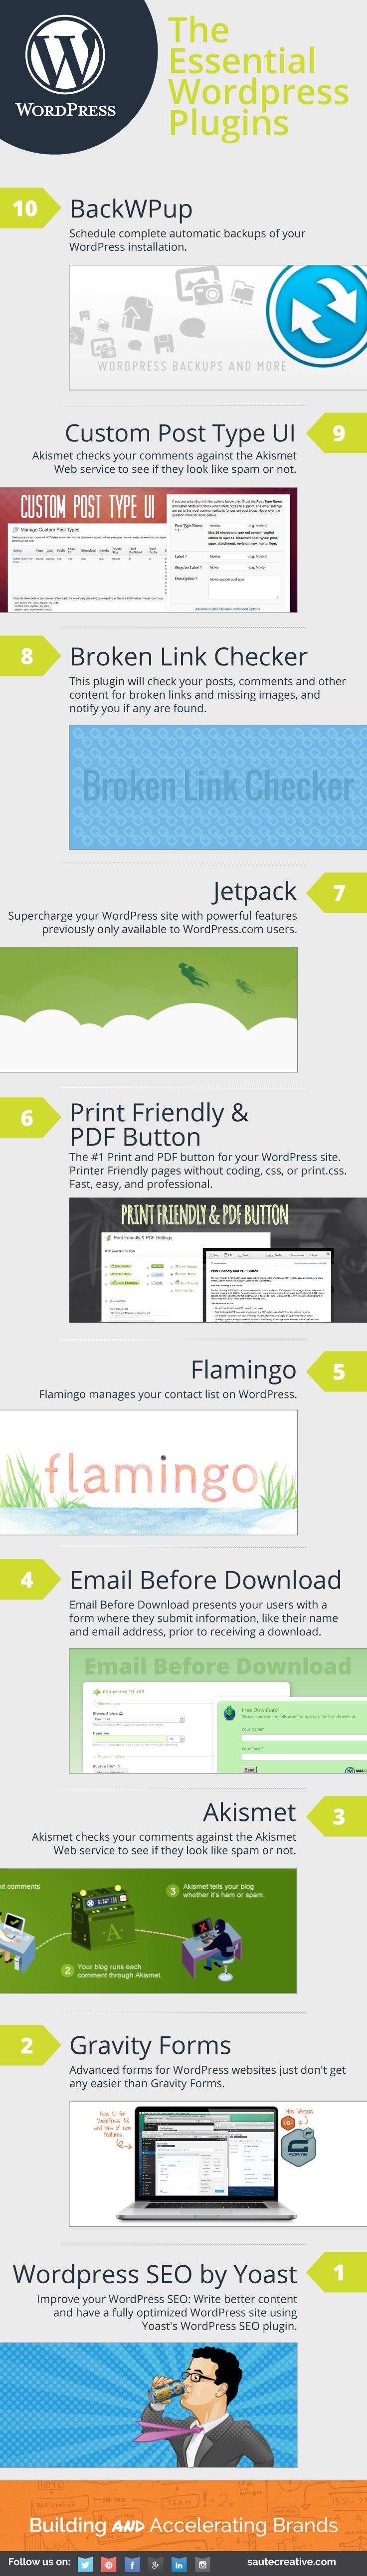 wordpress_plugins_infographic